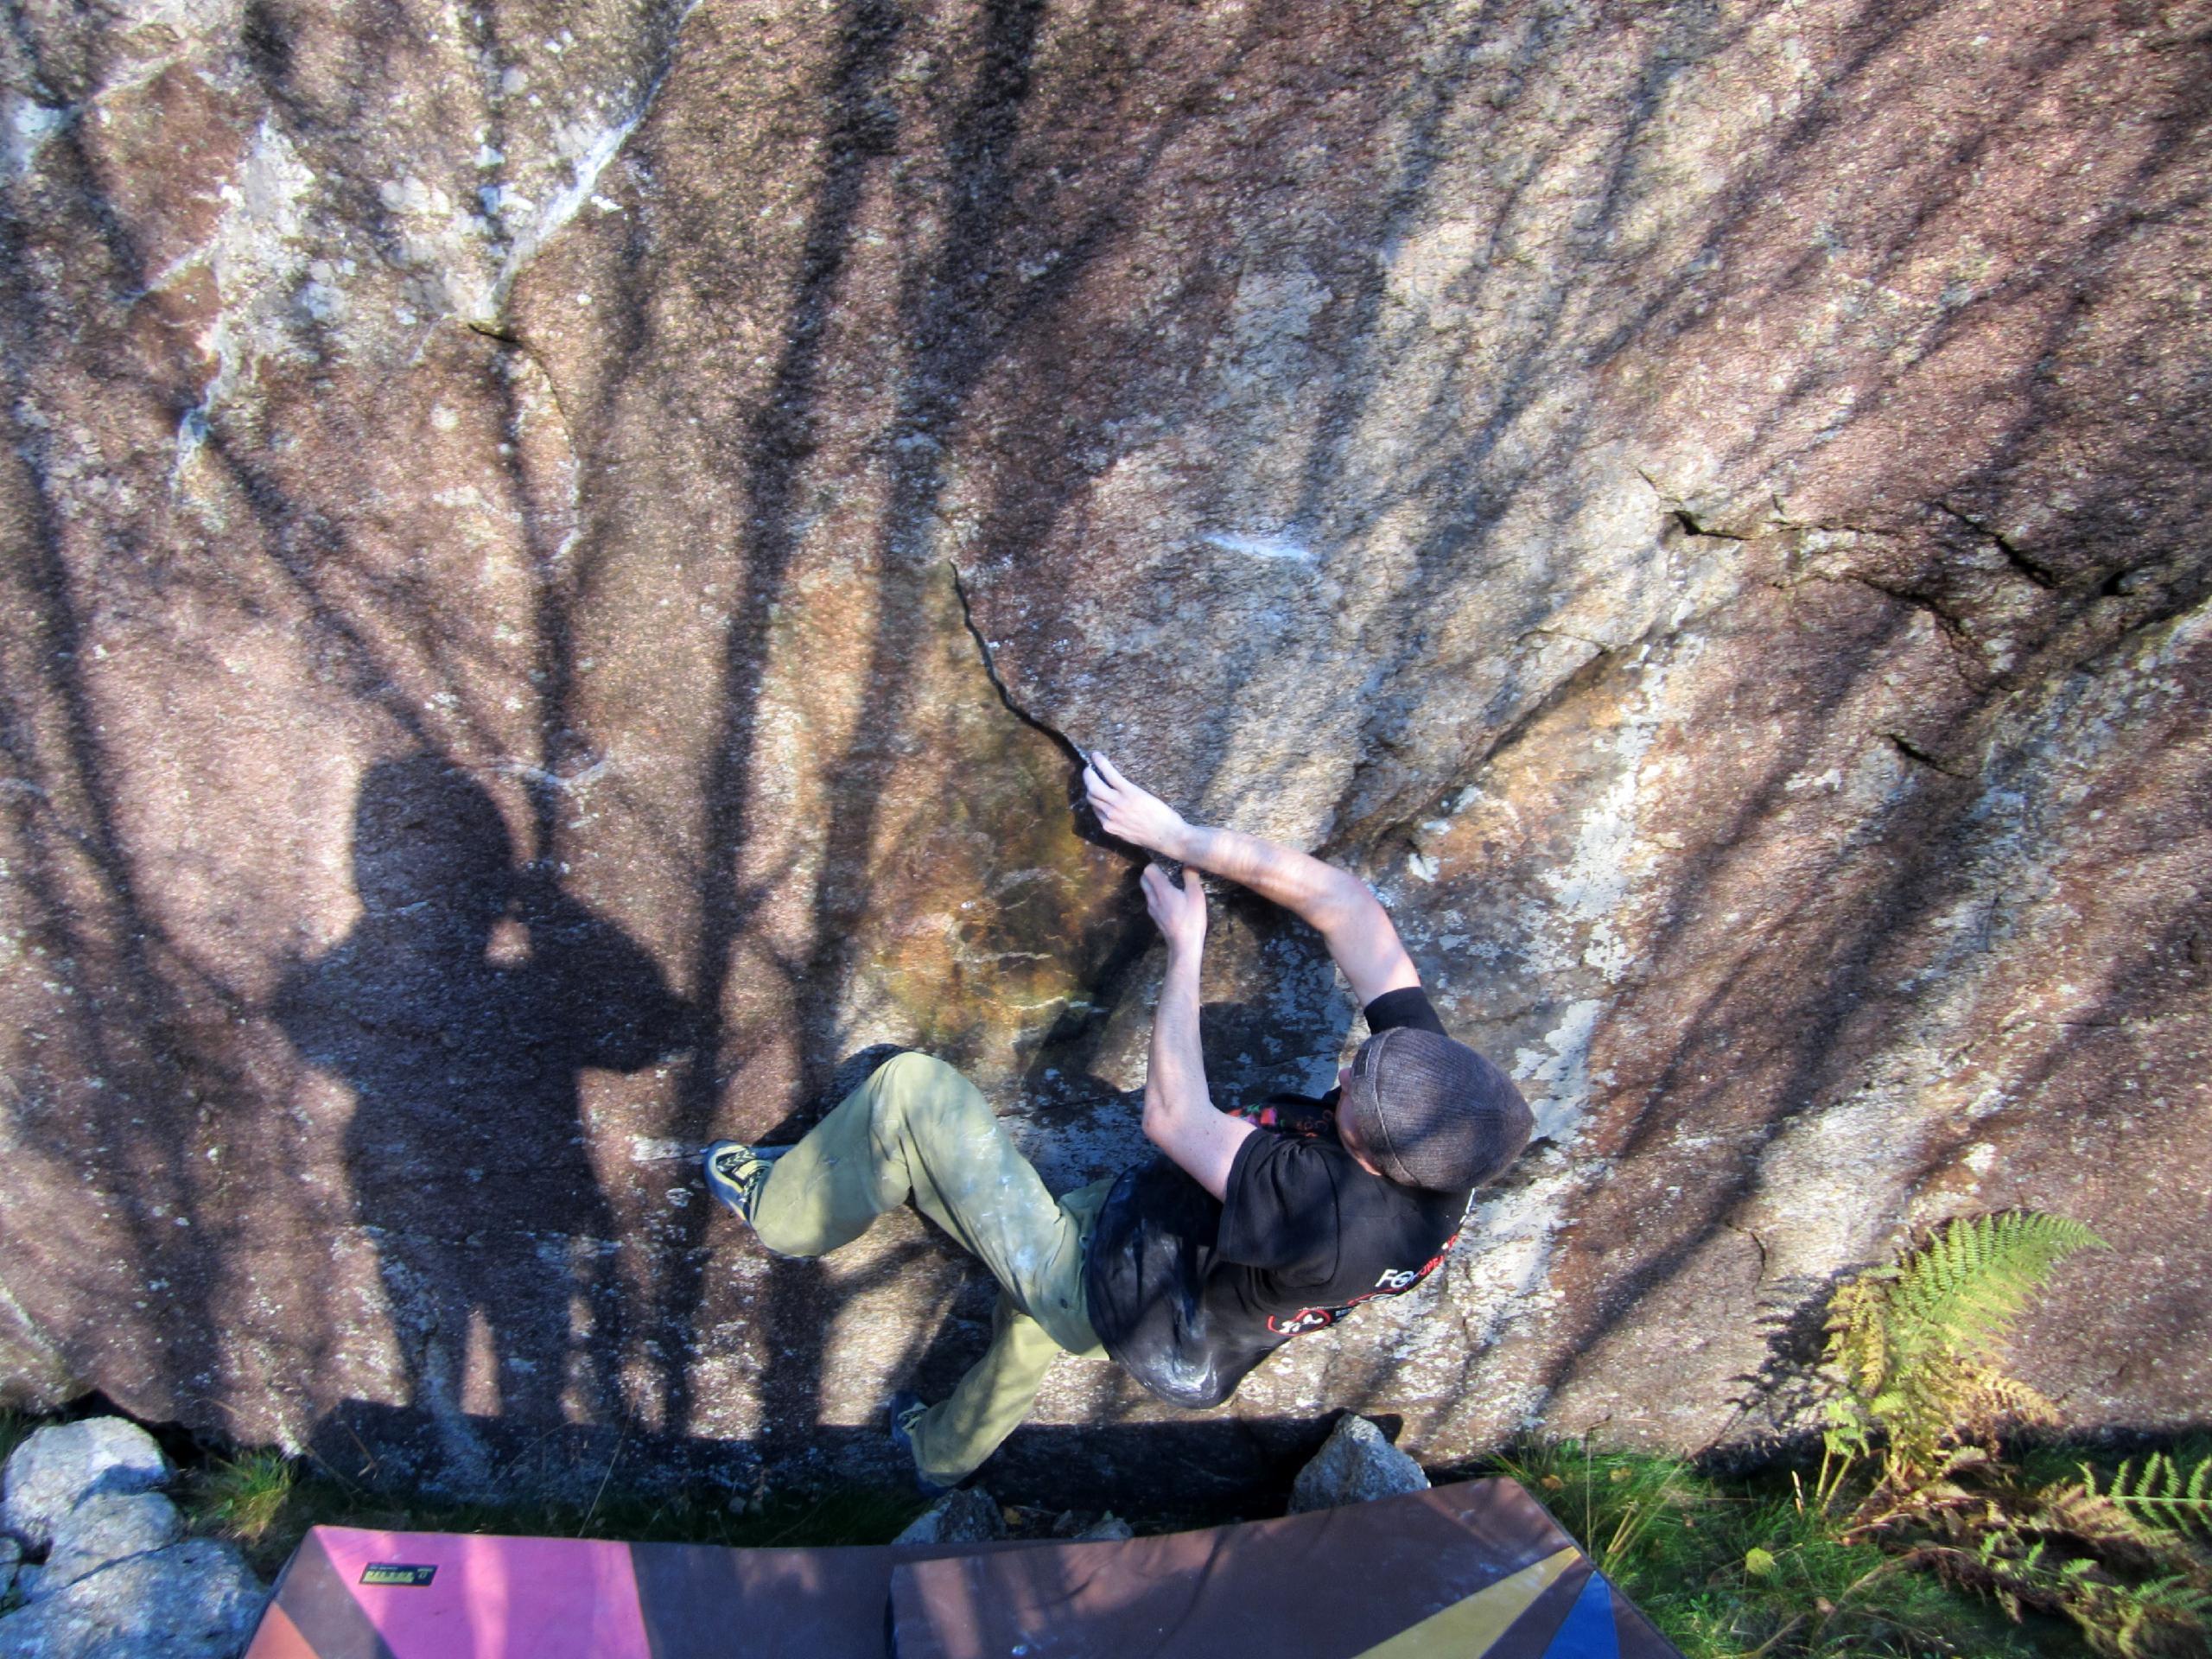 photographer: Jostein Øygarden, in photo: Lasse Lorentzen